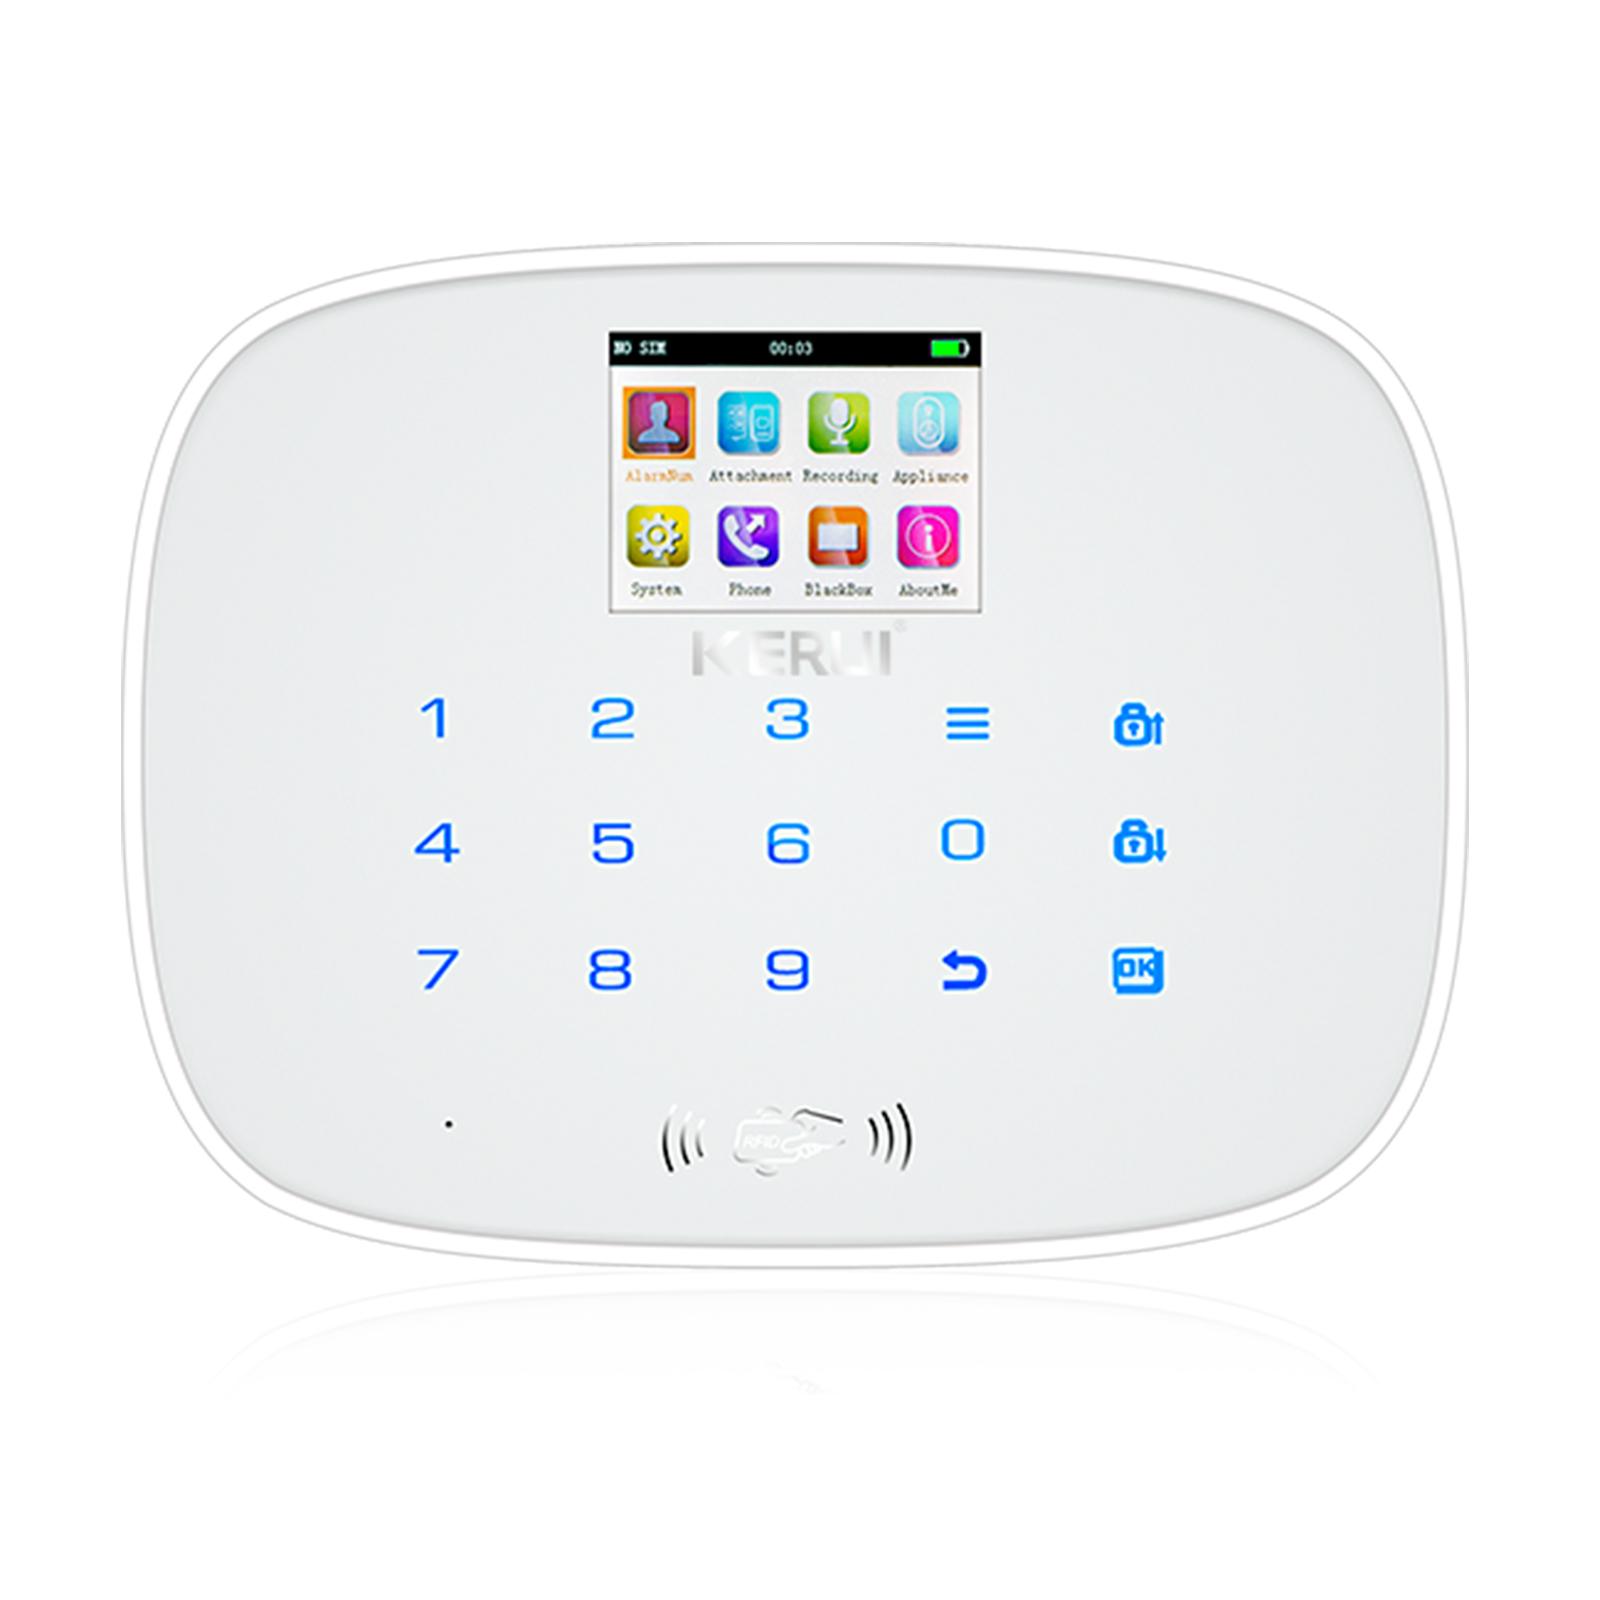 KERUI-All-Series-Alarm-Accessories-for-K7-W1-W2-G18-G19-W193-Alarm-System-Lot